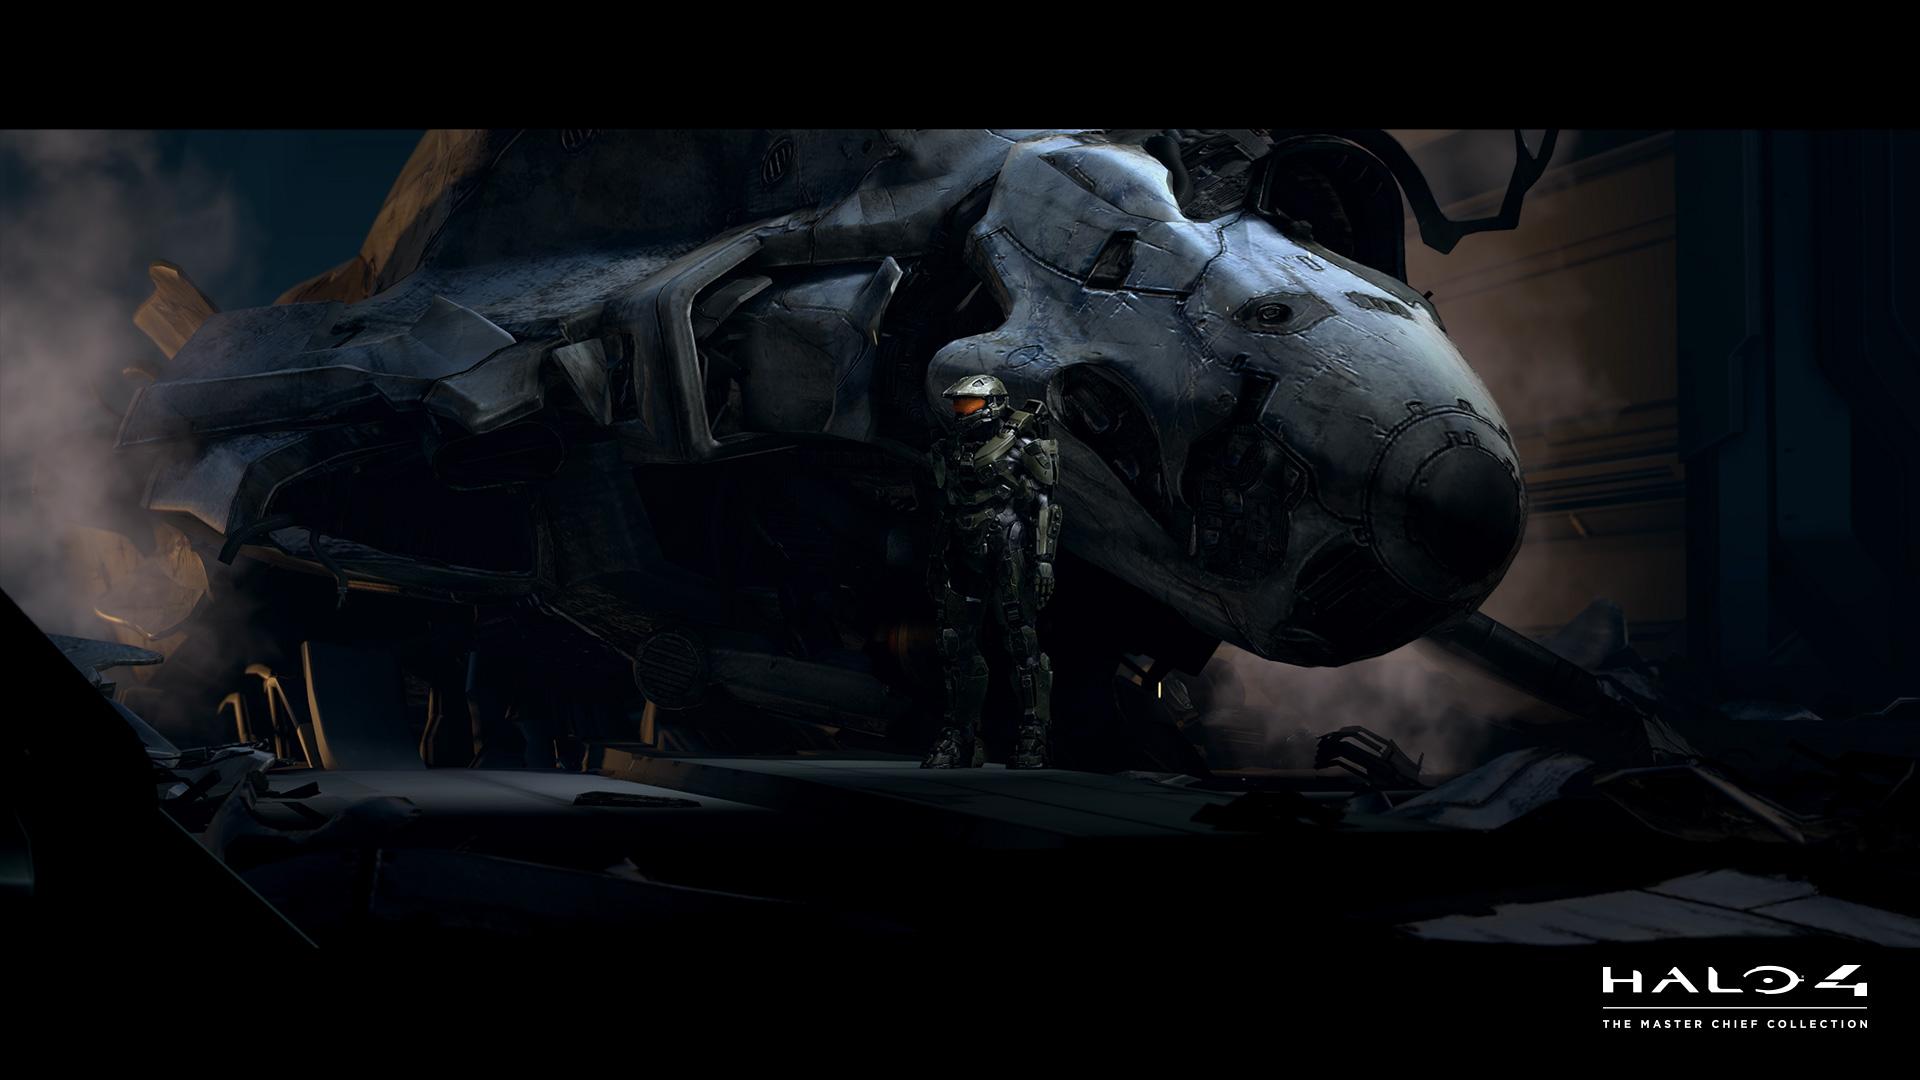 Halo-Master-Chief-Collection-2020_H4_Cinematics_08_Watermark_1920x1080